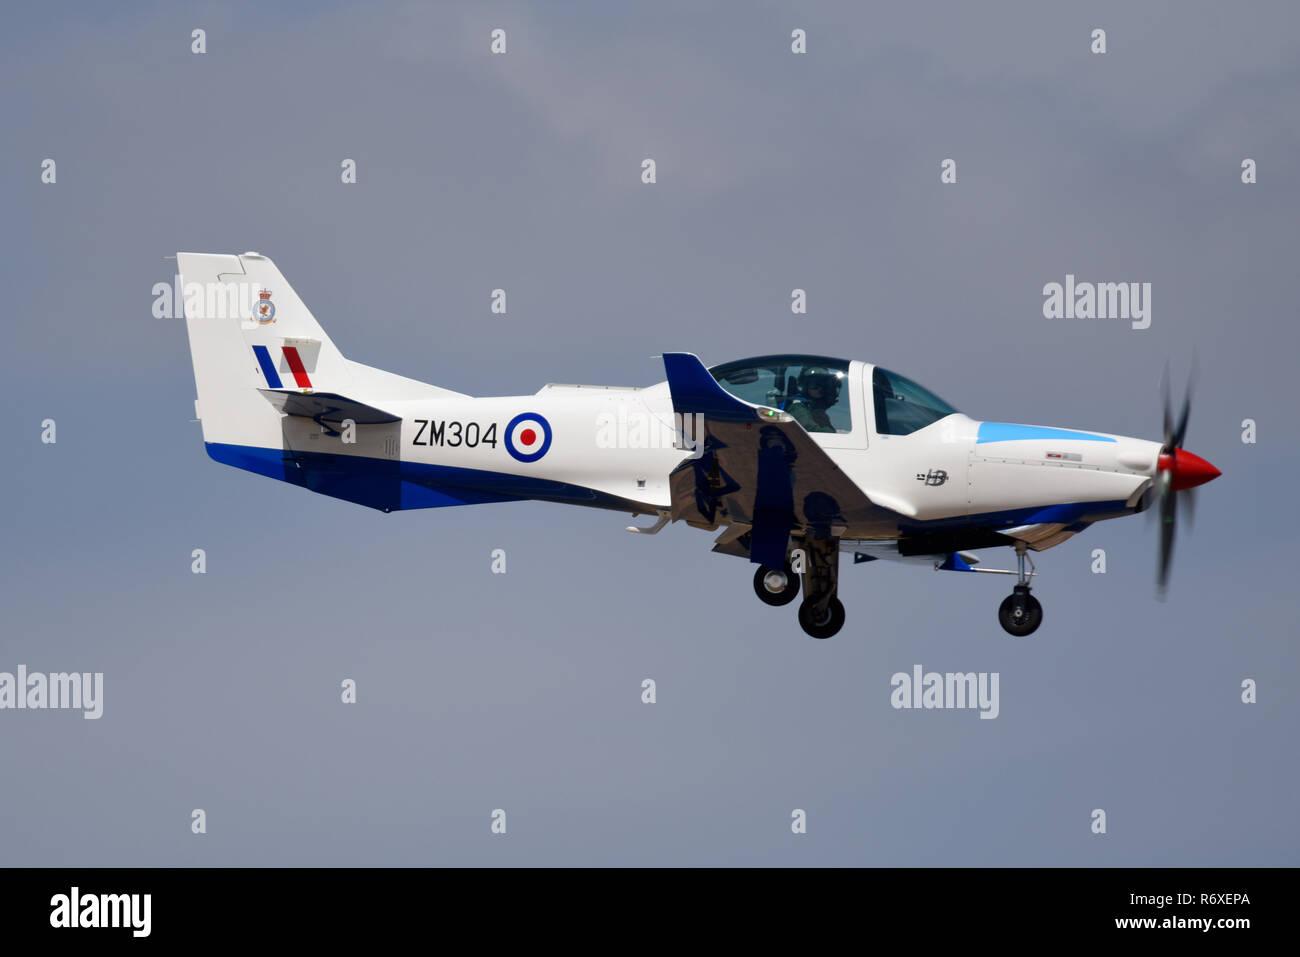 Grob 120 Ebene der Affinität Flying Training Services Ltd trainer Ebene für die Royal Air Force Royal International Air Tattoo, RIAT RAF Fairford Airshow Stockbild